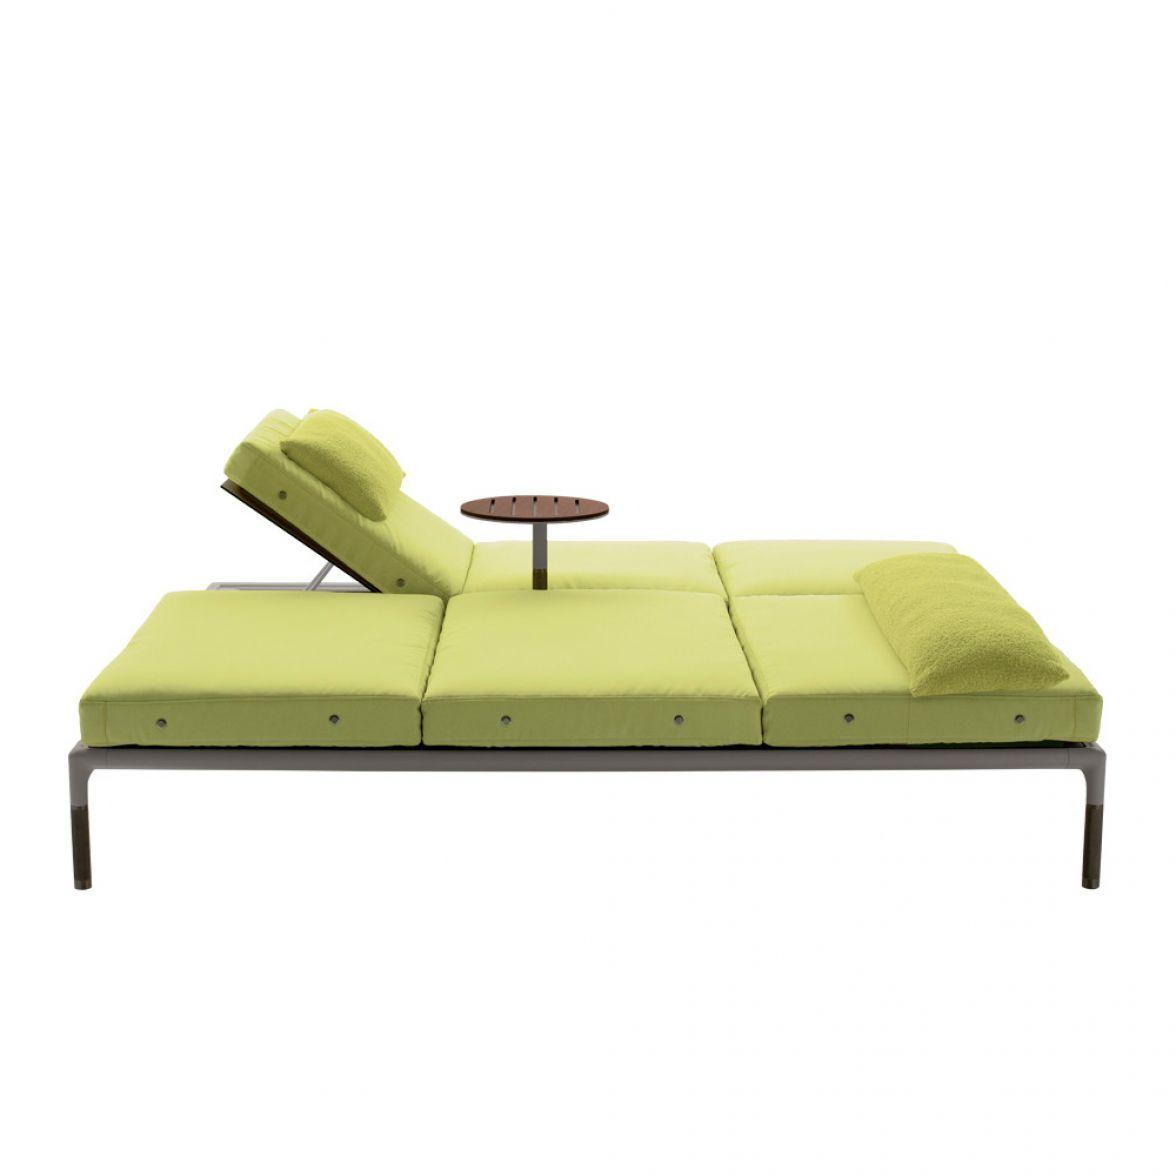 Springtime chaise lounge